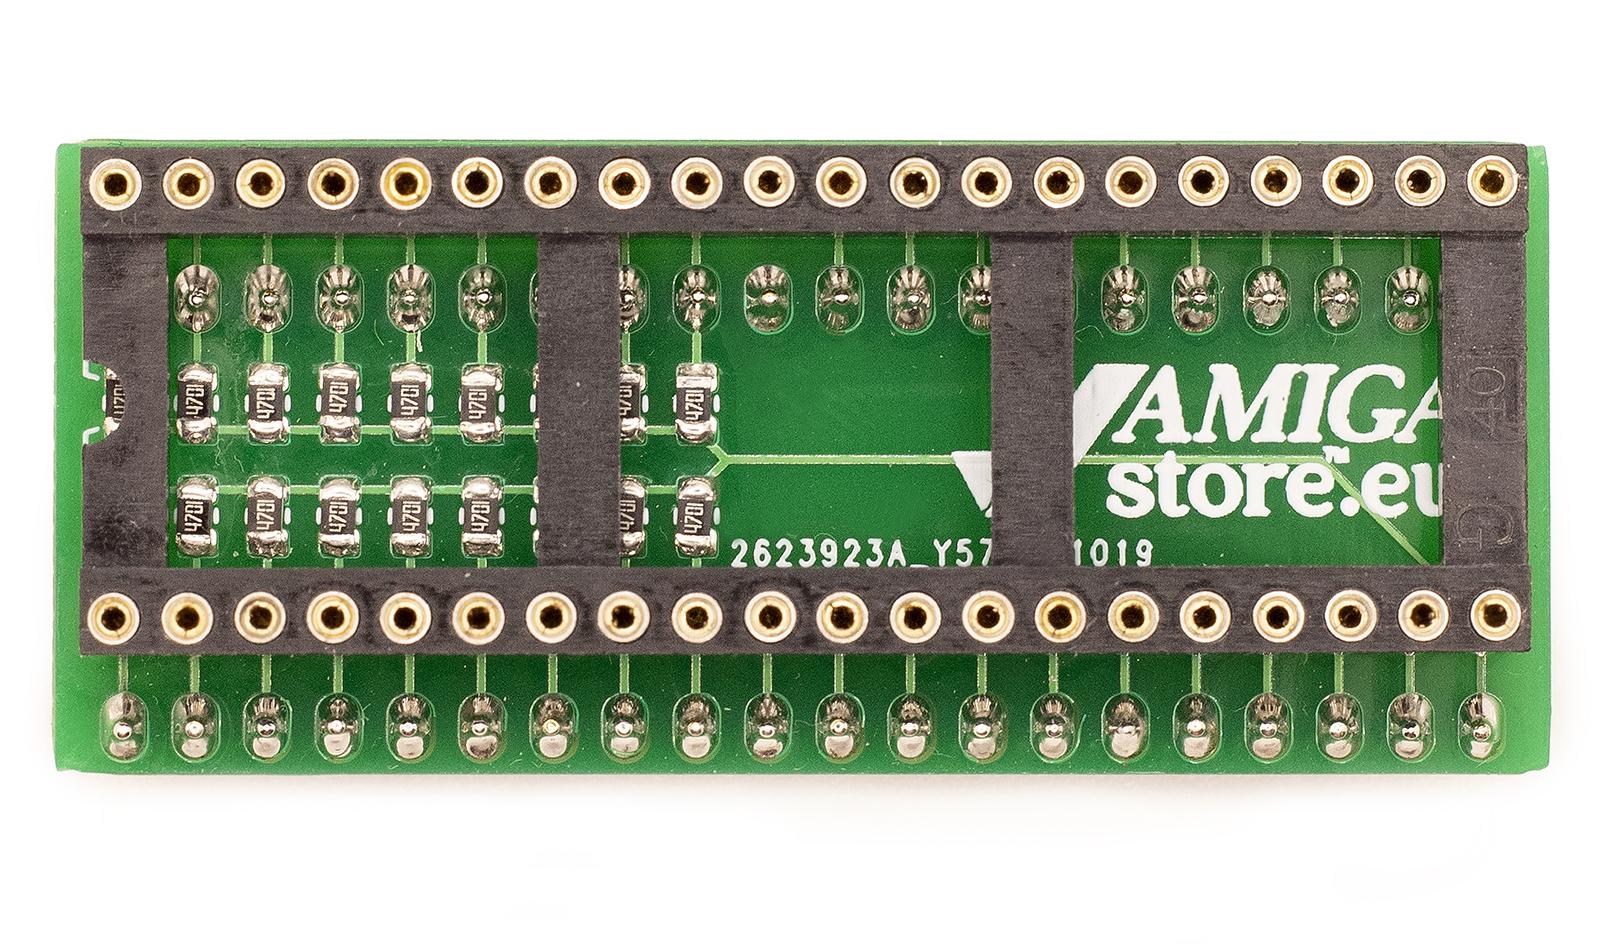 Amiga 500 Eprom Adapter